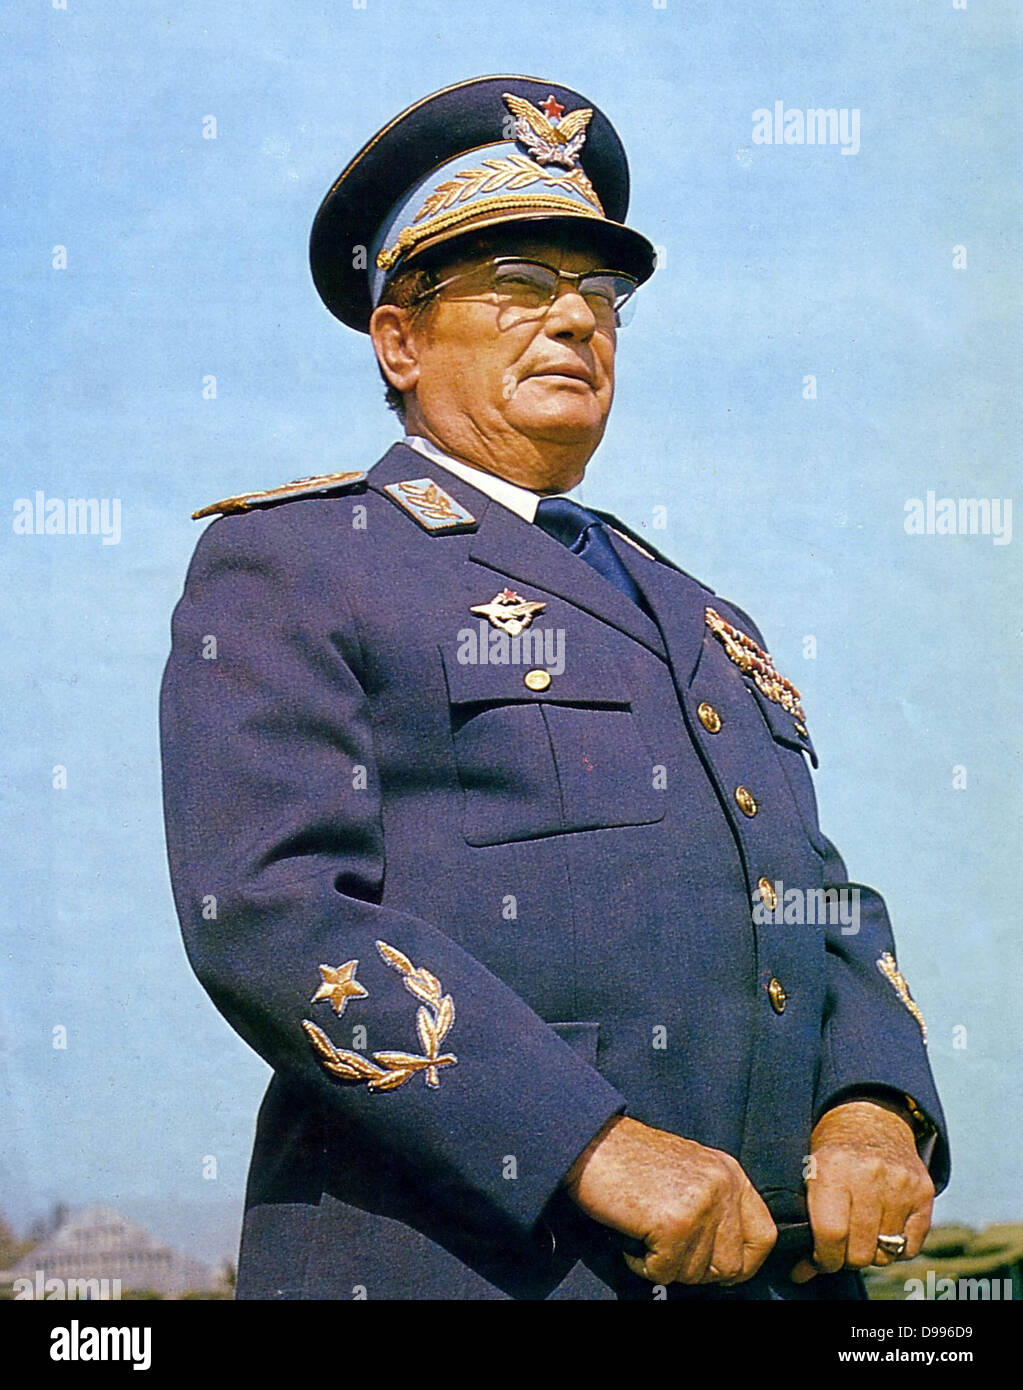 Josip Broz Tito (1892 - 1980) Yugoslav revolutionary and statesman. Secretary-General (later President) of the Communist - Stock Image